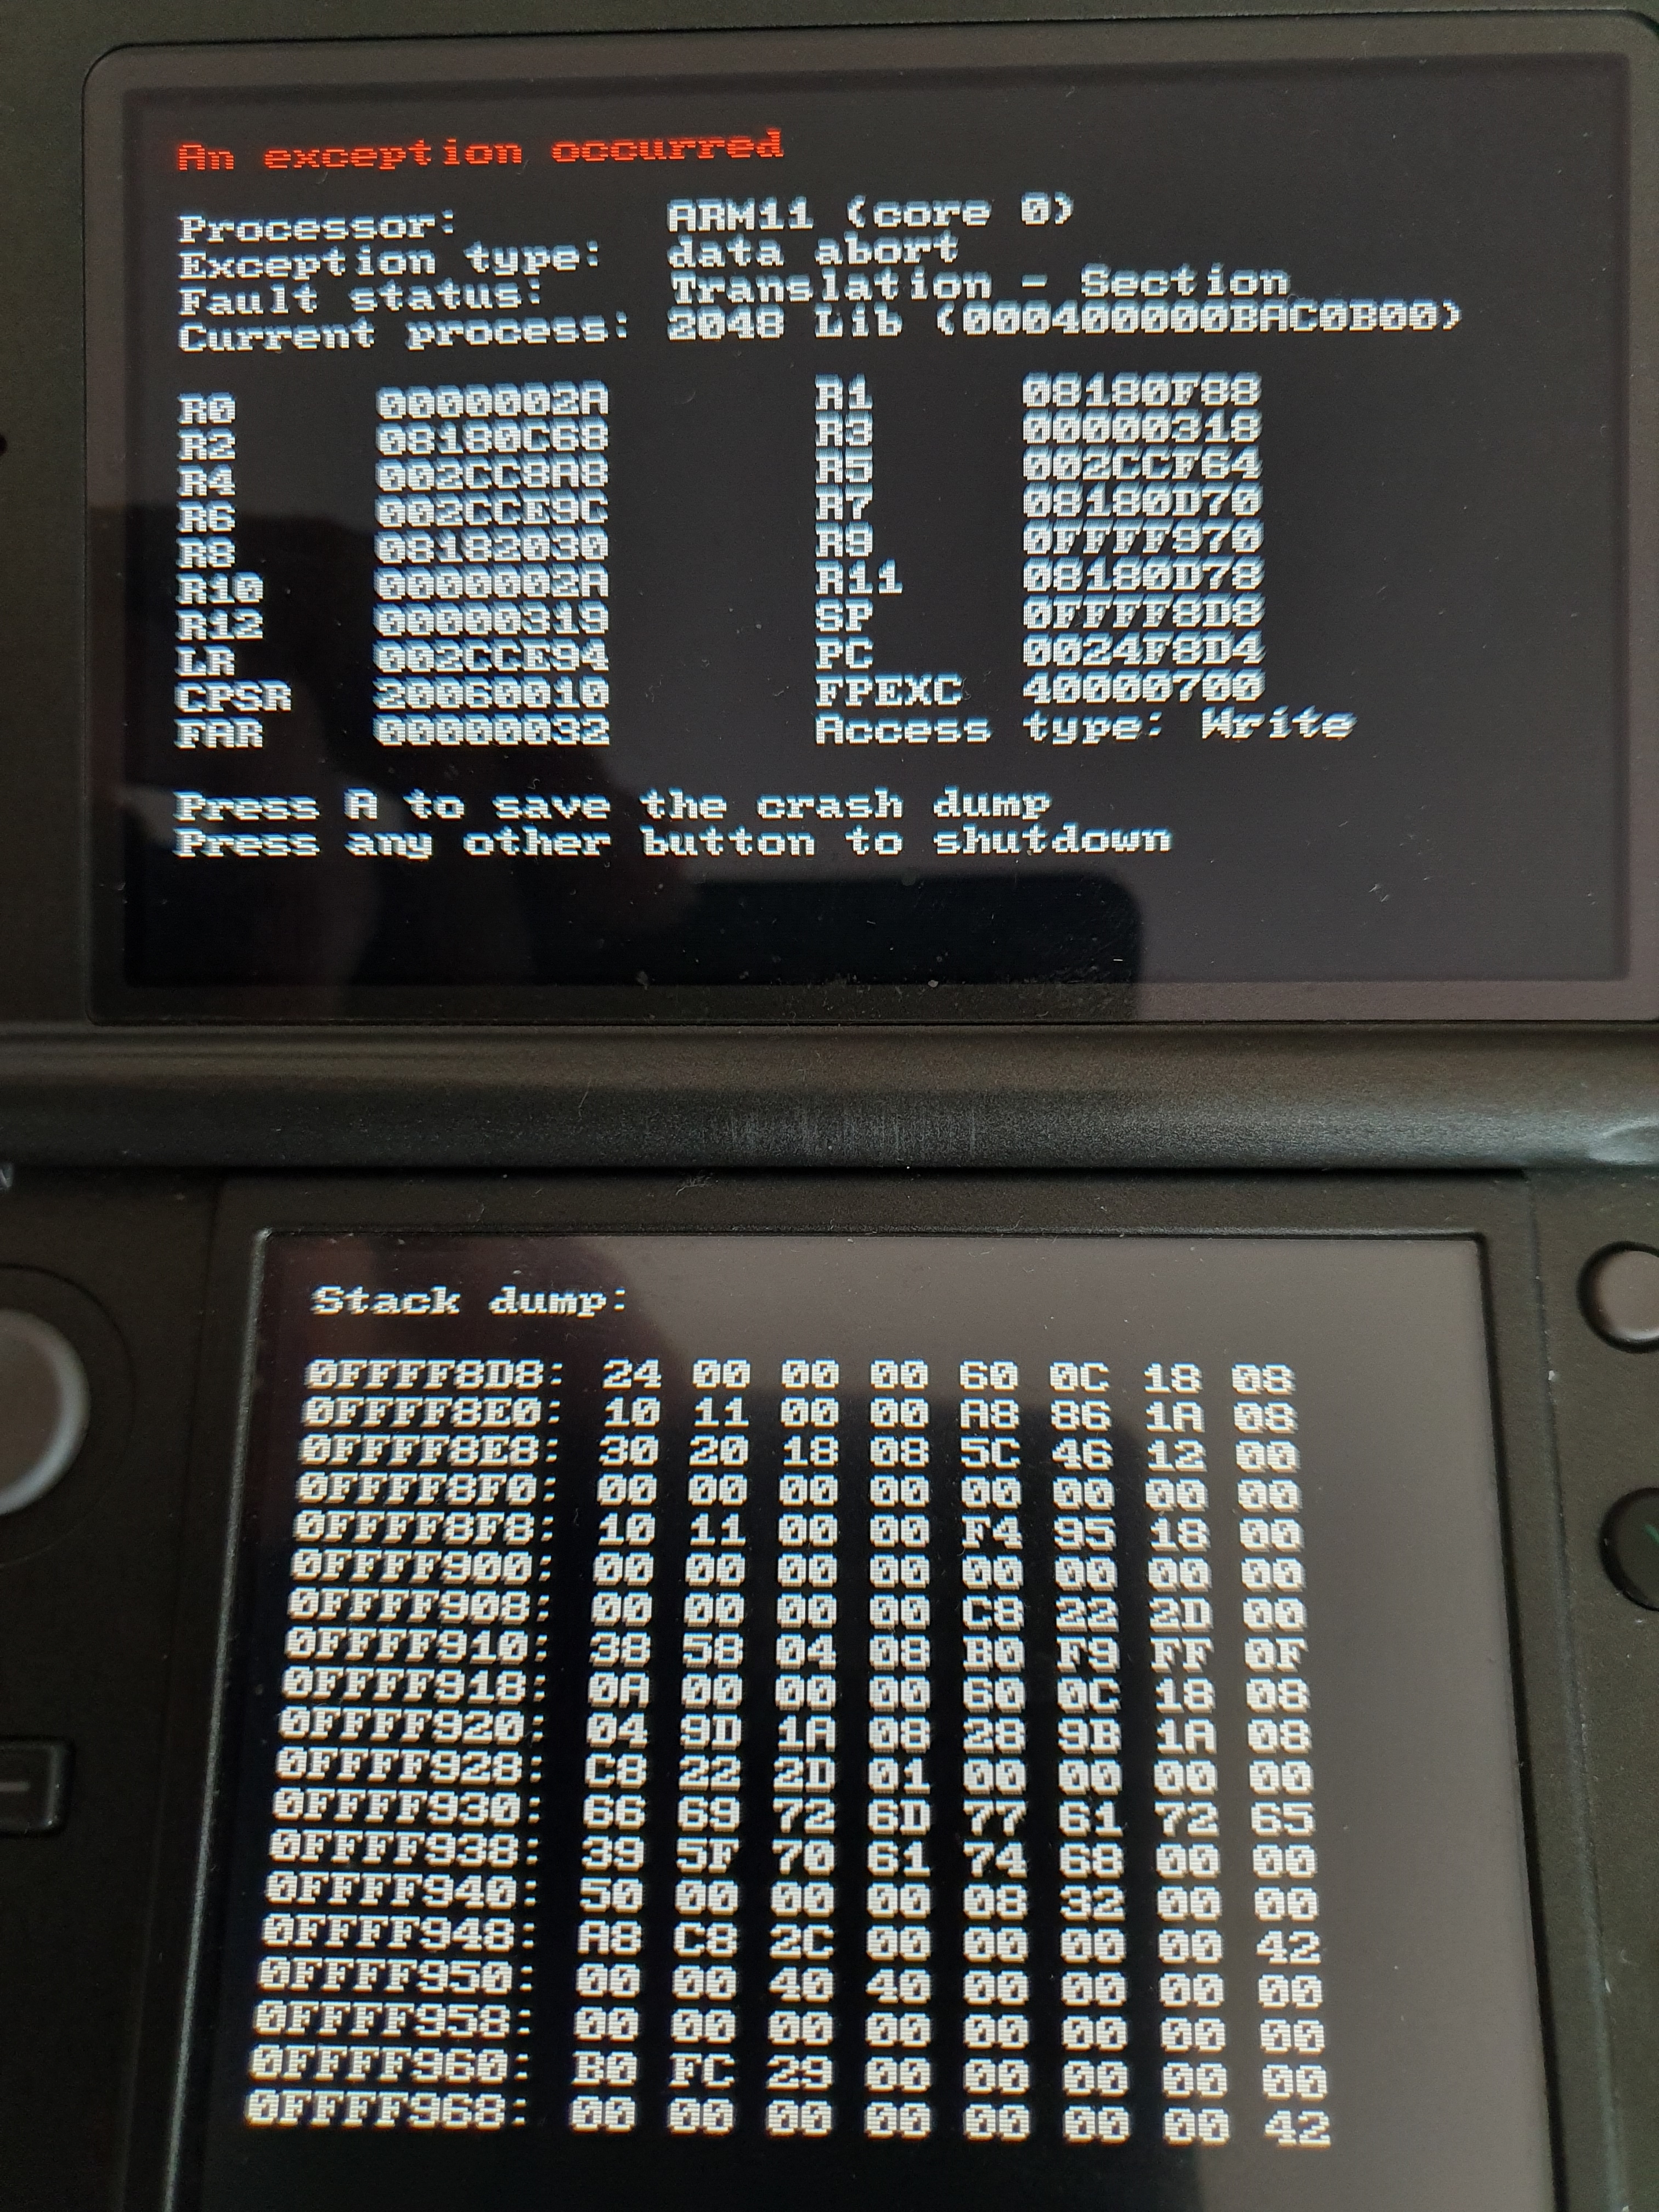 3DS cia builds crash after being started (since v1 7 7